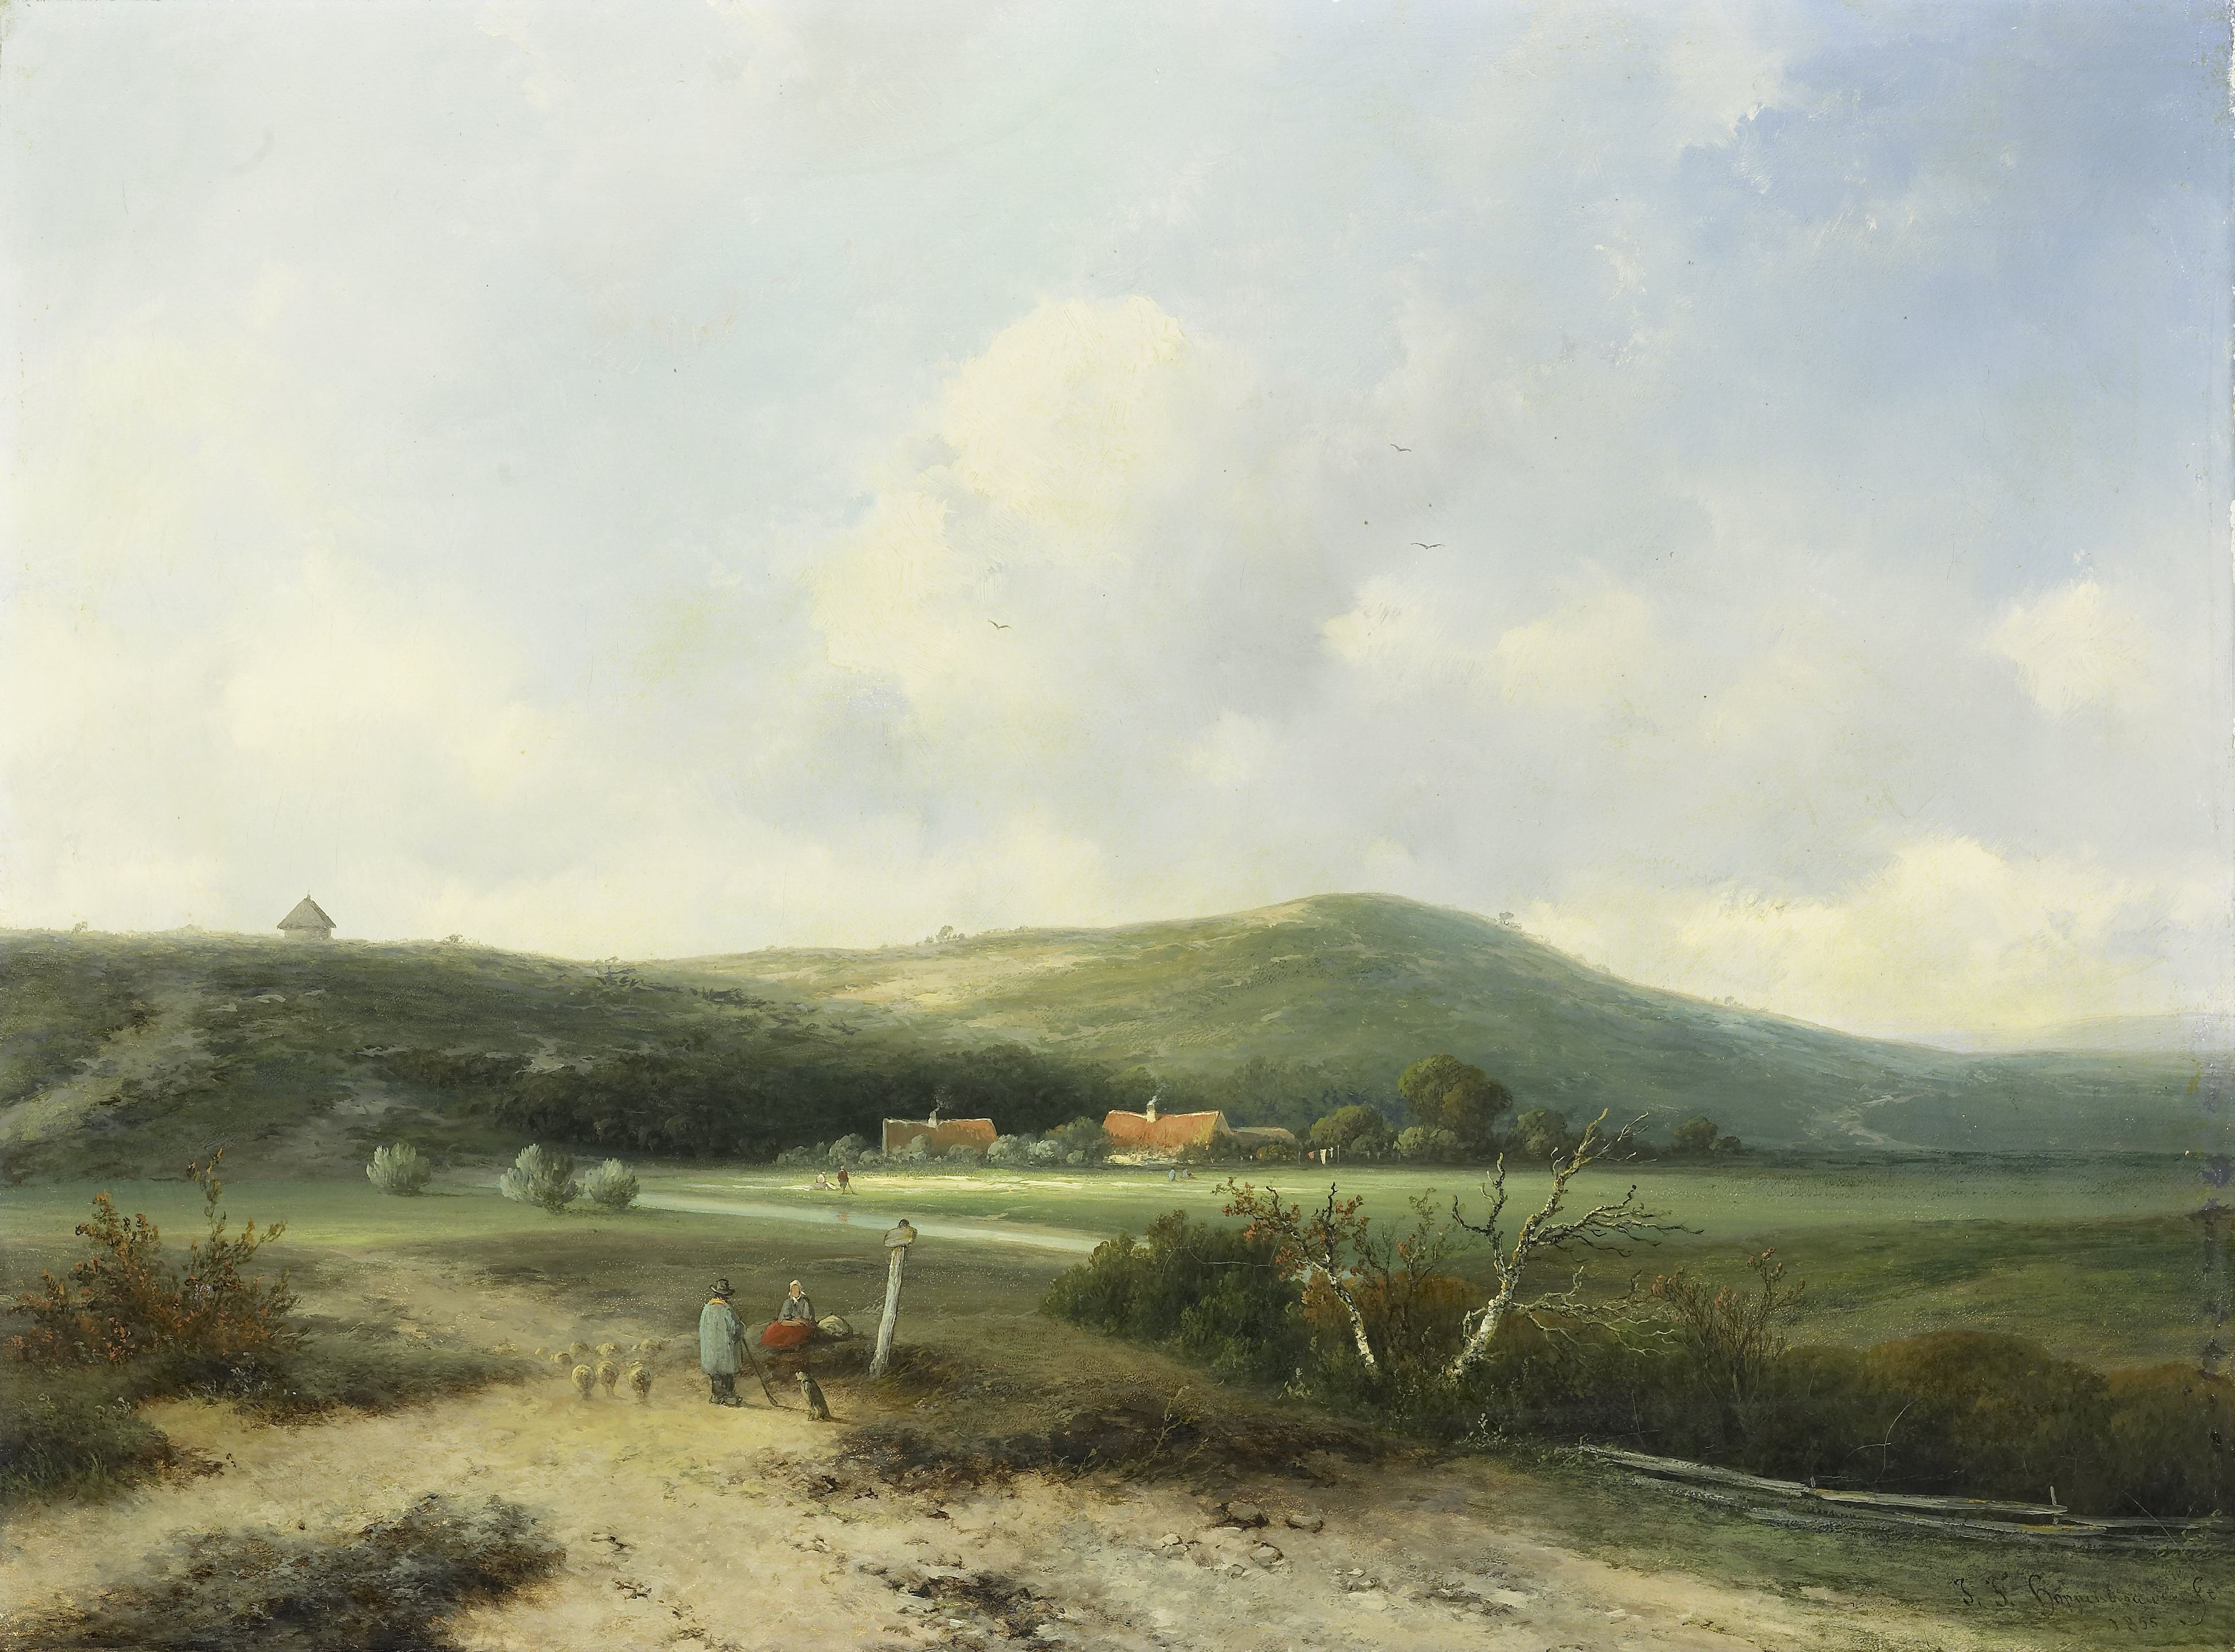 Johannes Franciscus Hoppenbrouwers